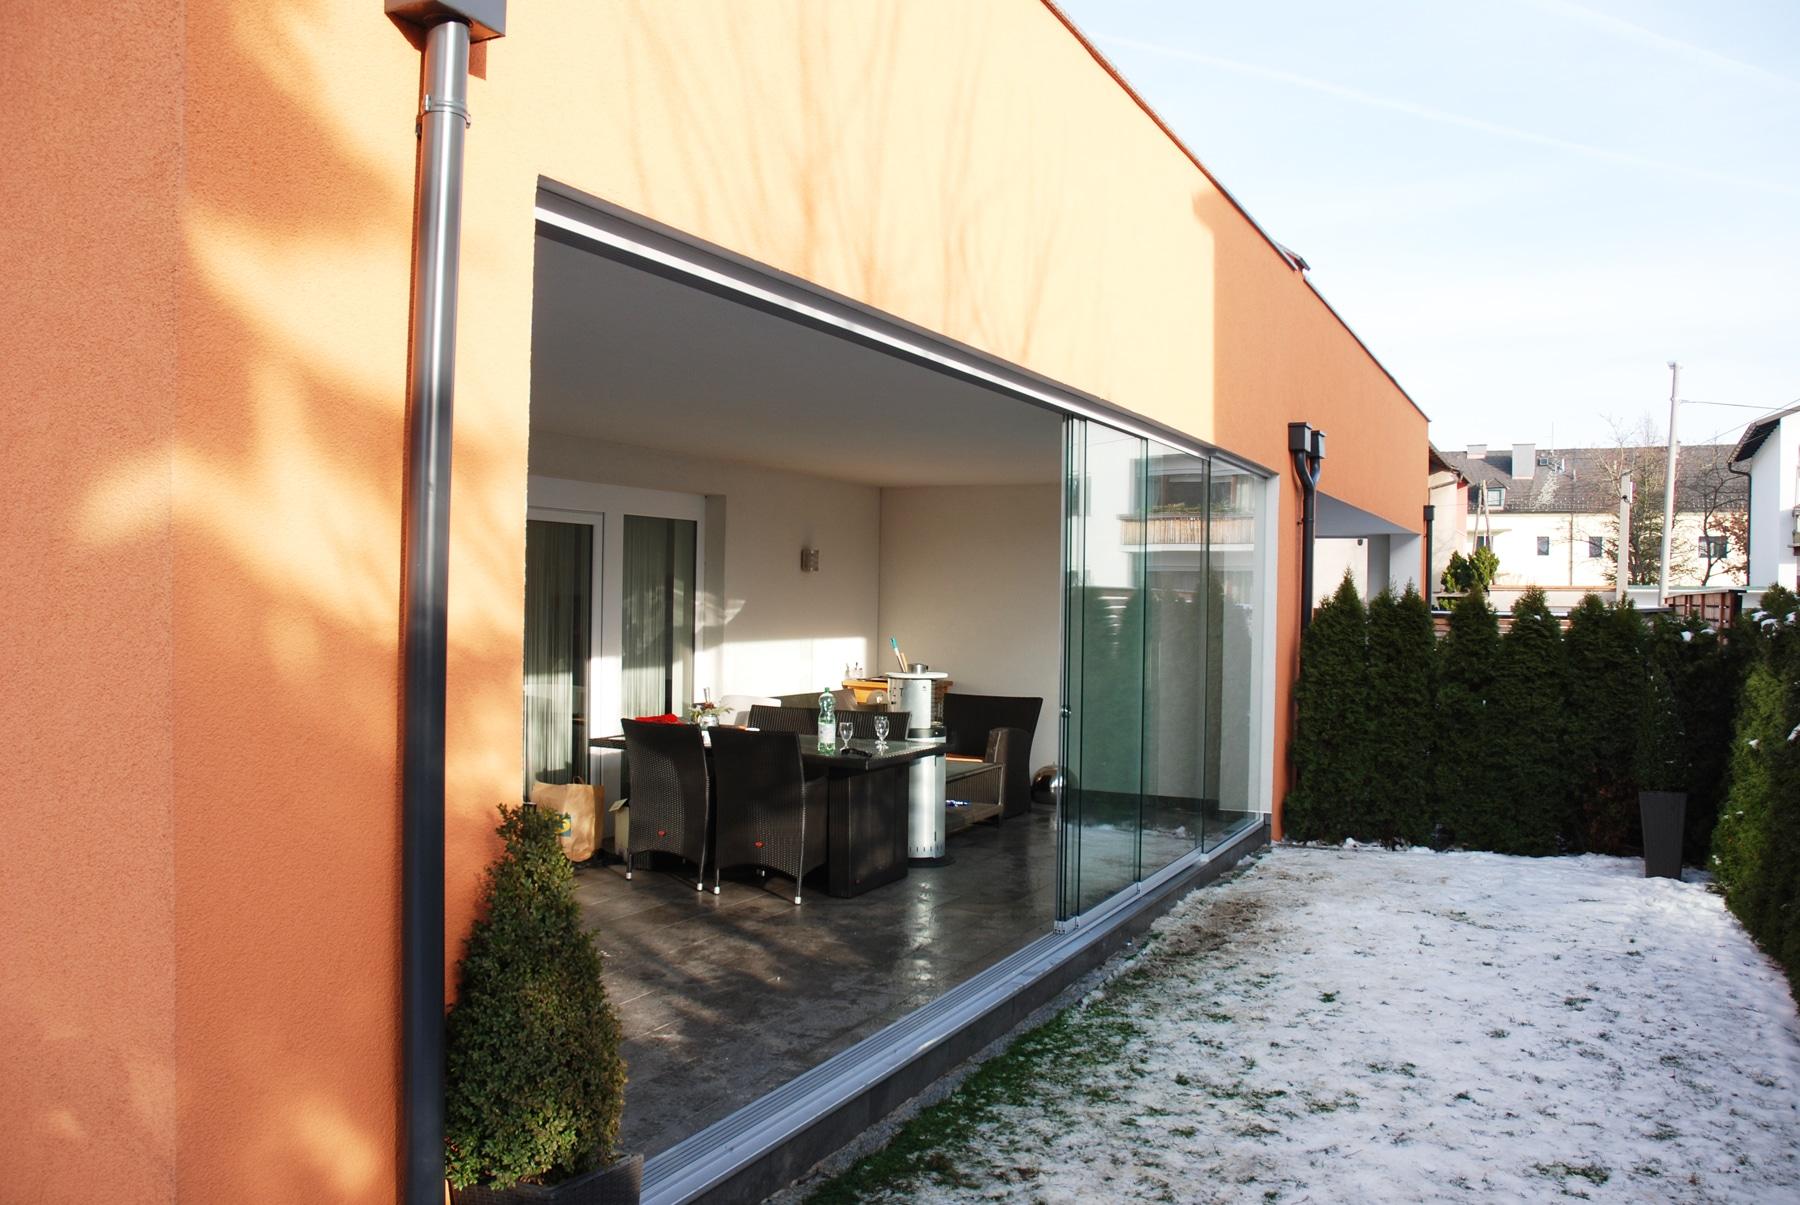 wintergarten schiebet ren aluminium wintergarten schmidinger. Black Bedroom Furniture Sets. Home Design Ideas